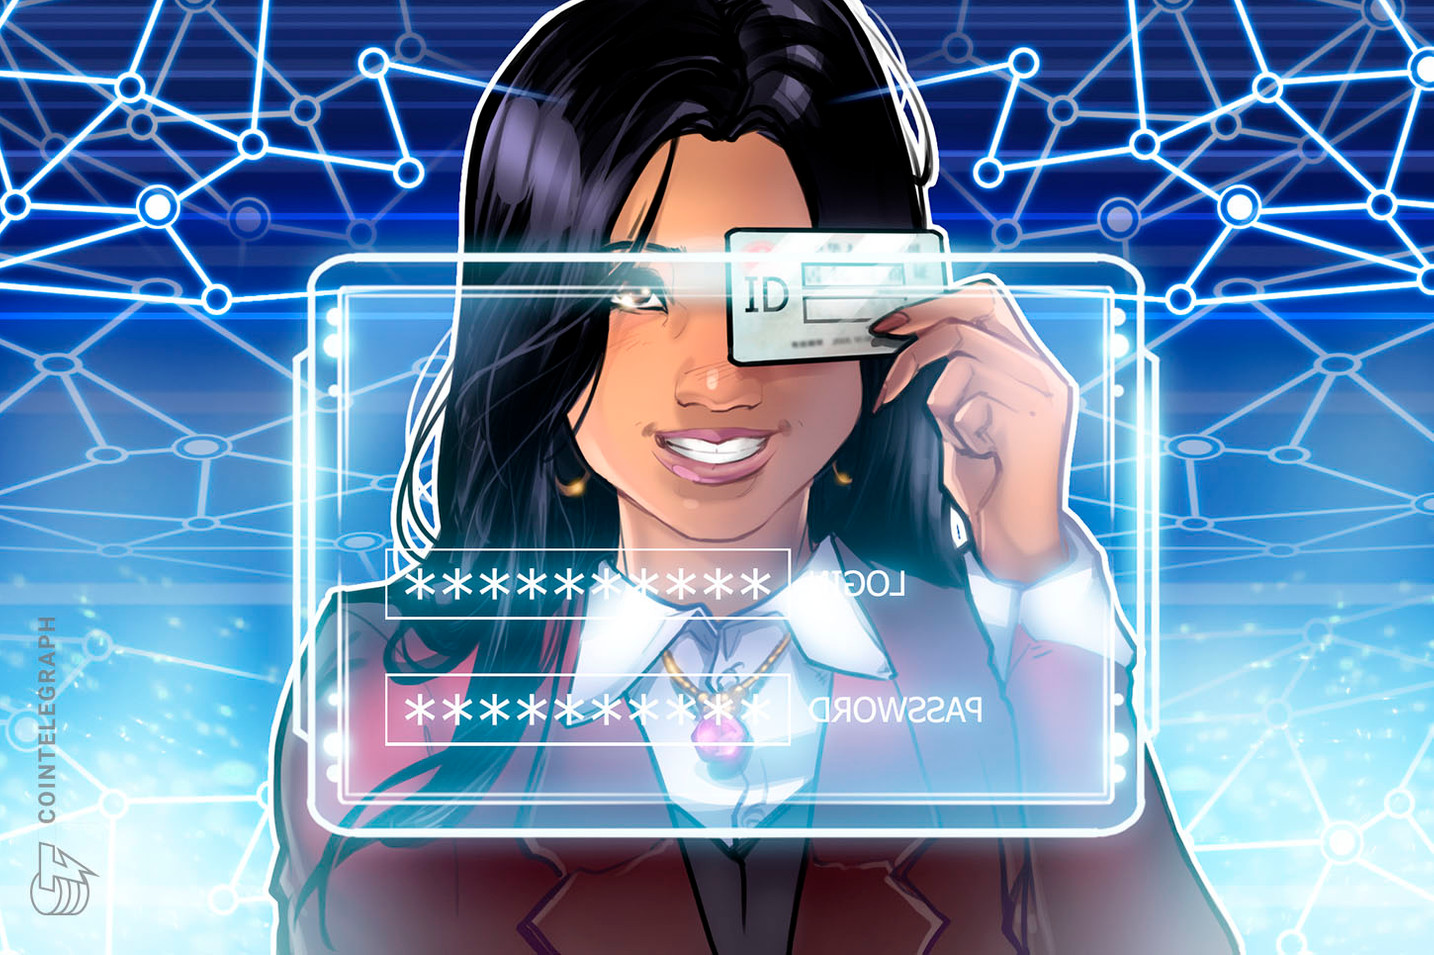 Tecnologia blockchain, identidades financeiras digitais e auto-soberanas